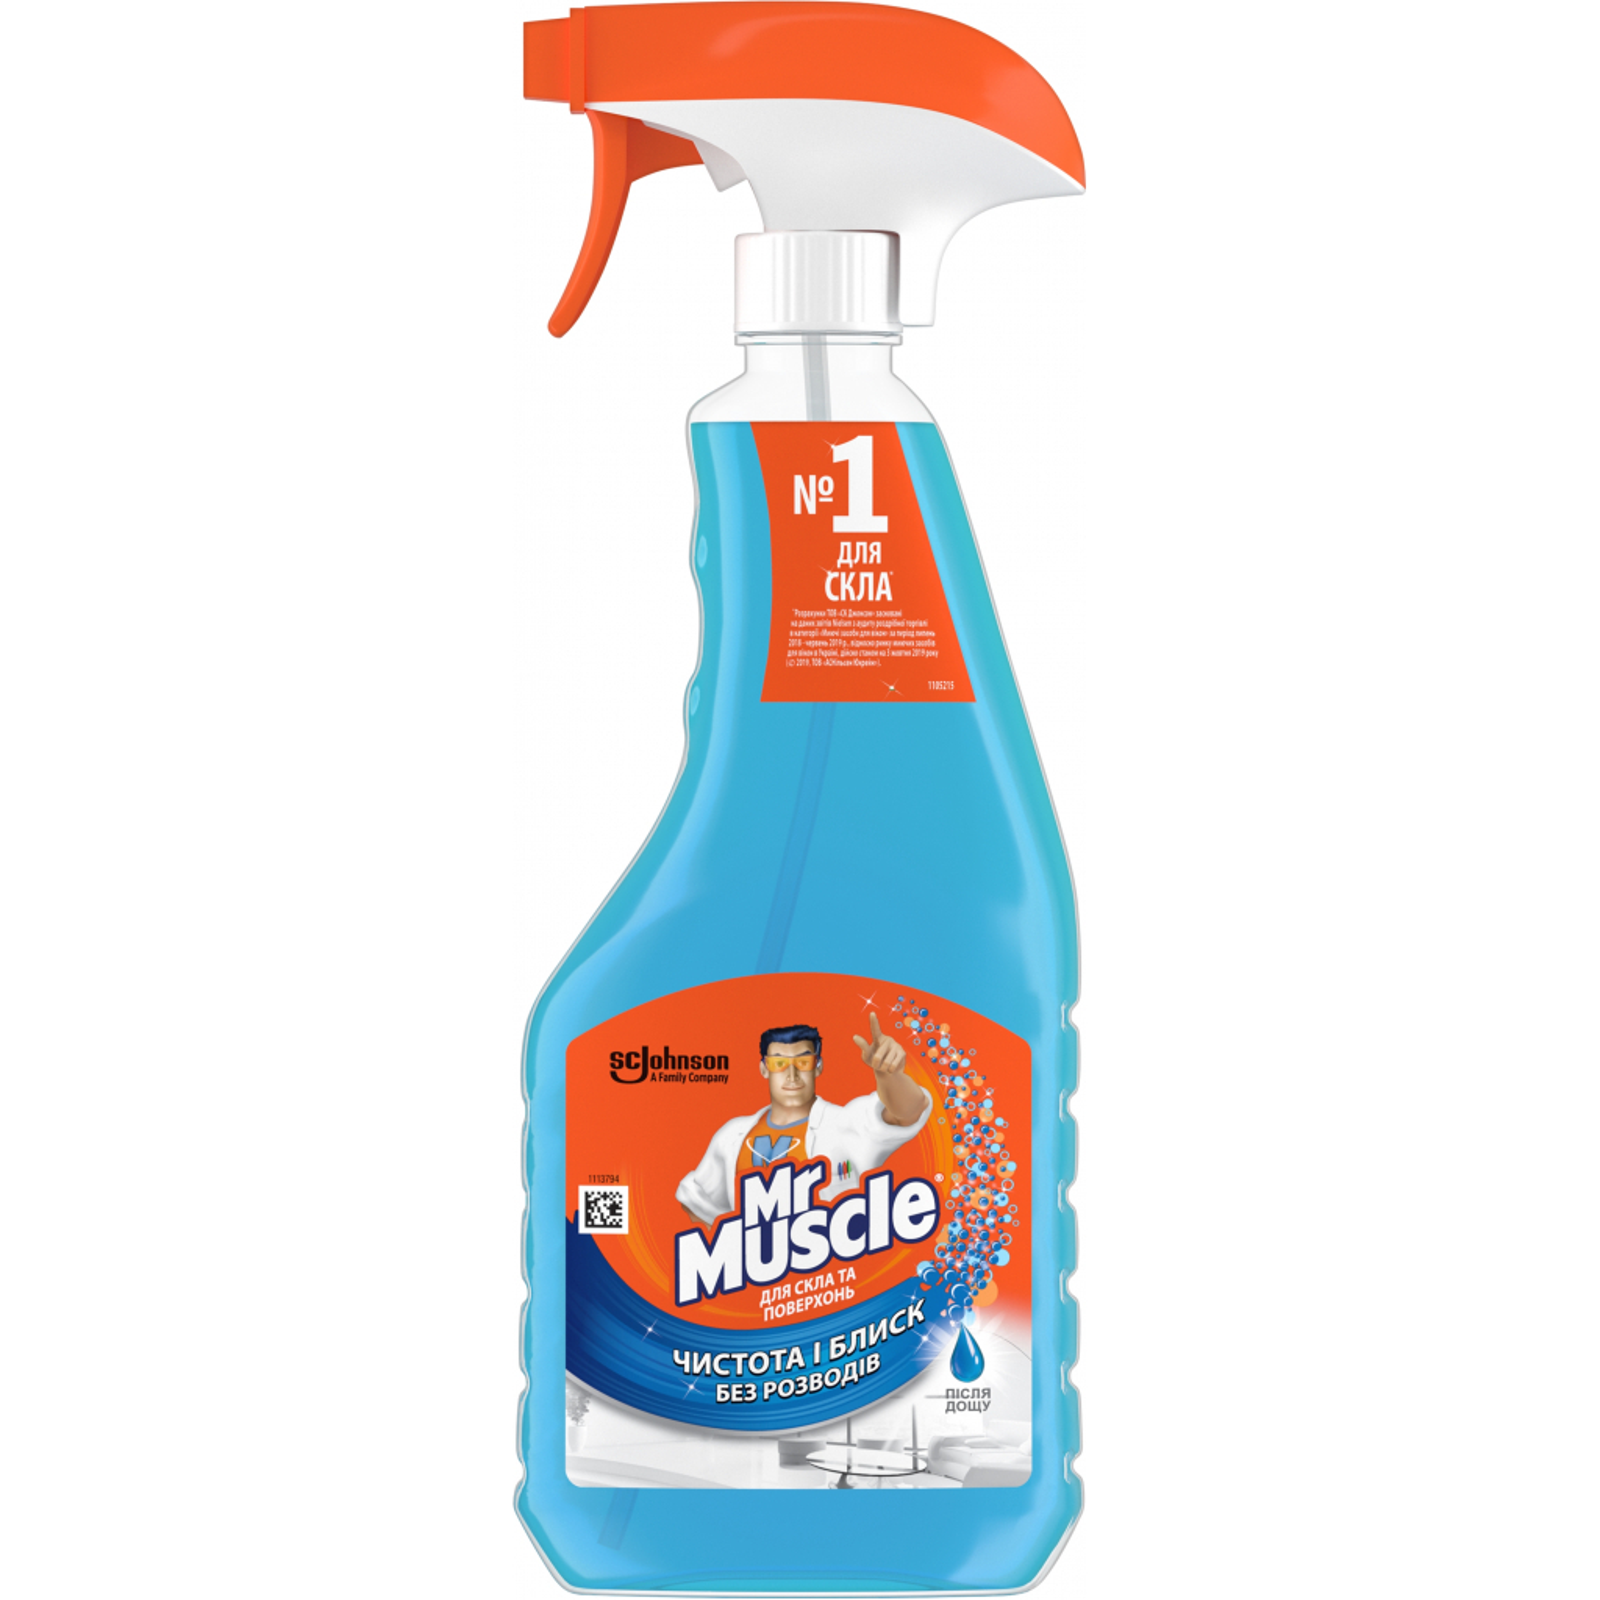 Моющая жидкость для уборки Мистер Мускул для стекол 500 мл (4823002001013)